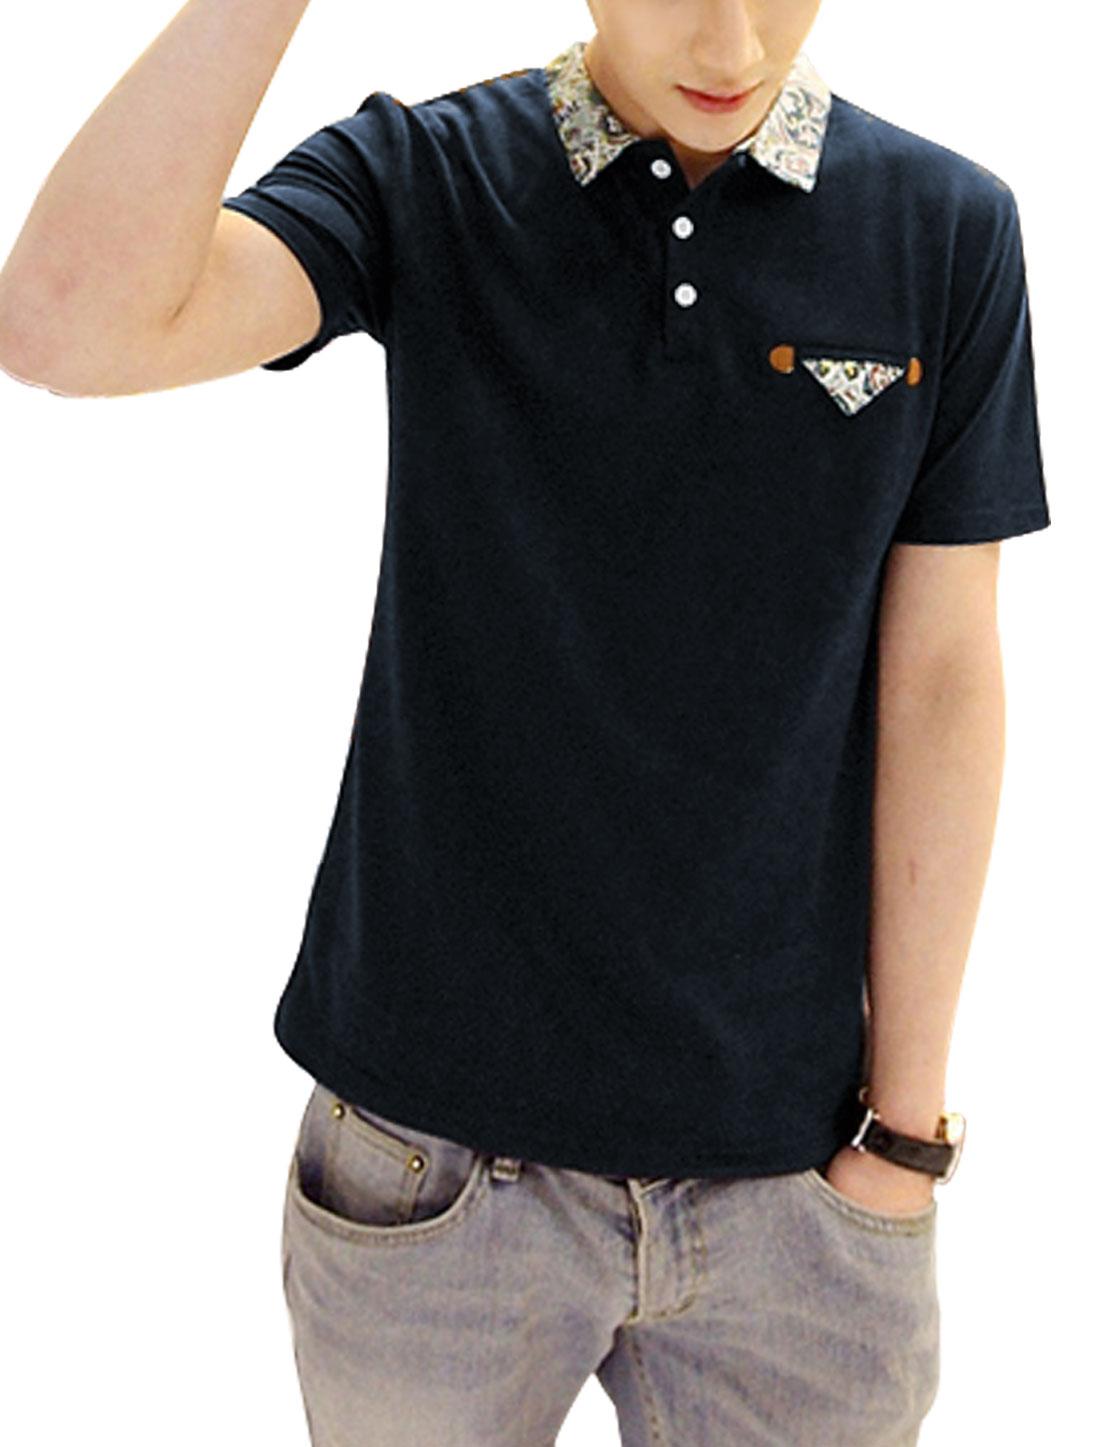 Men Point Collar Chest Pocket Decor Floral Prints Detail Shirt Navy Blue M